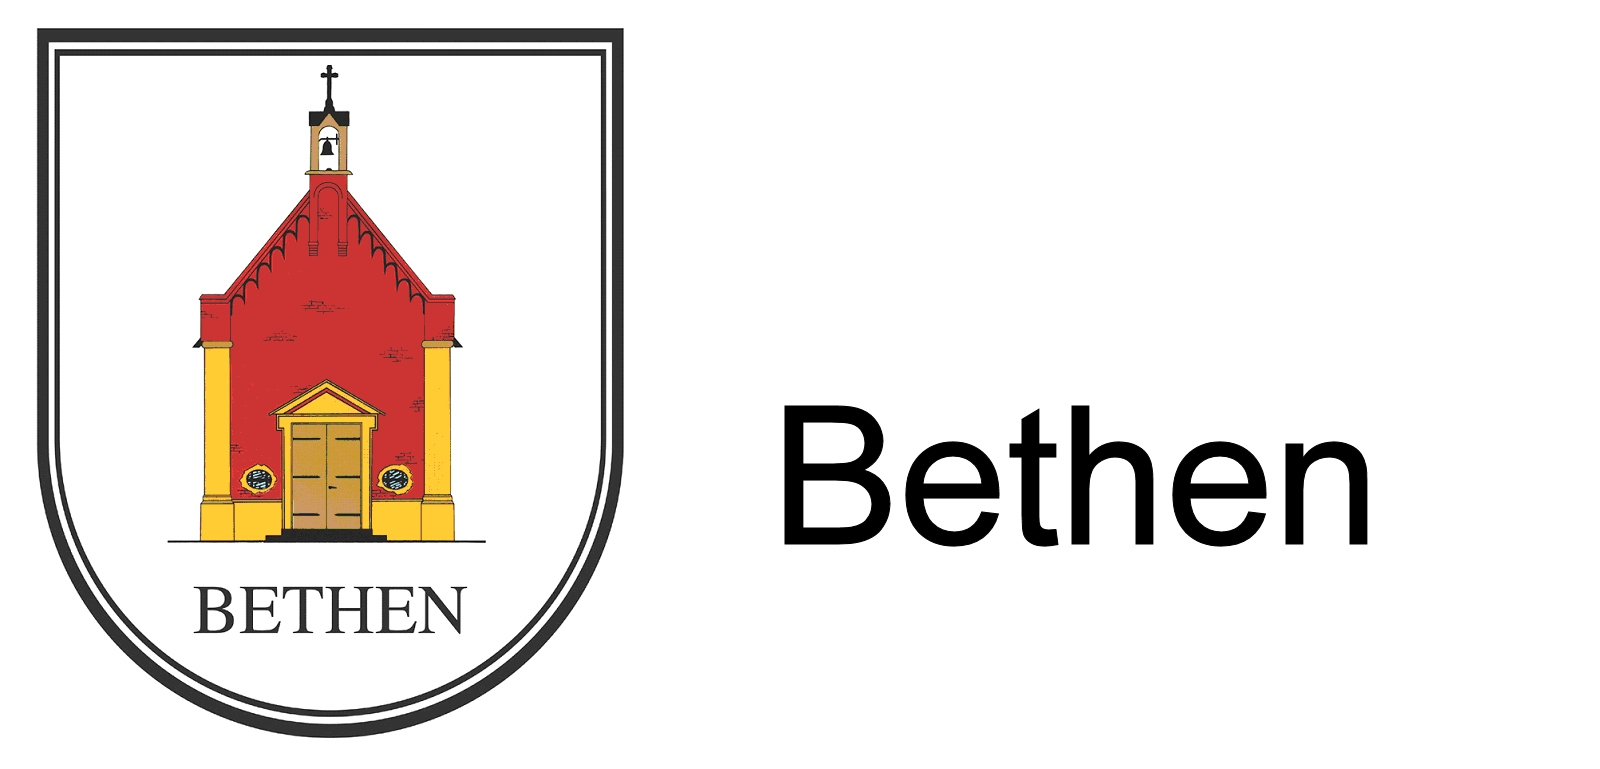 Bethen